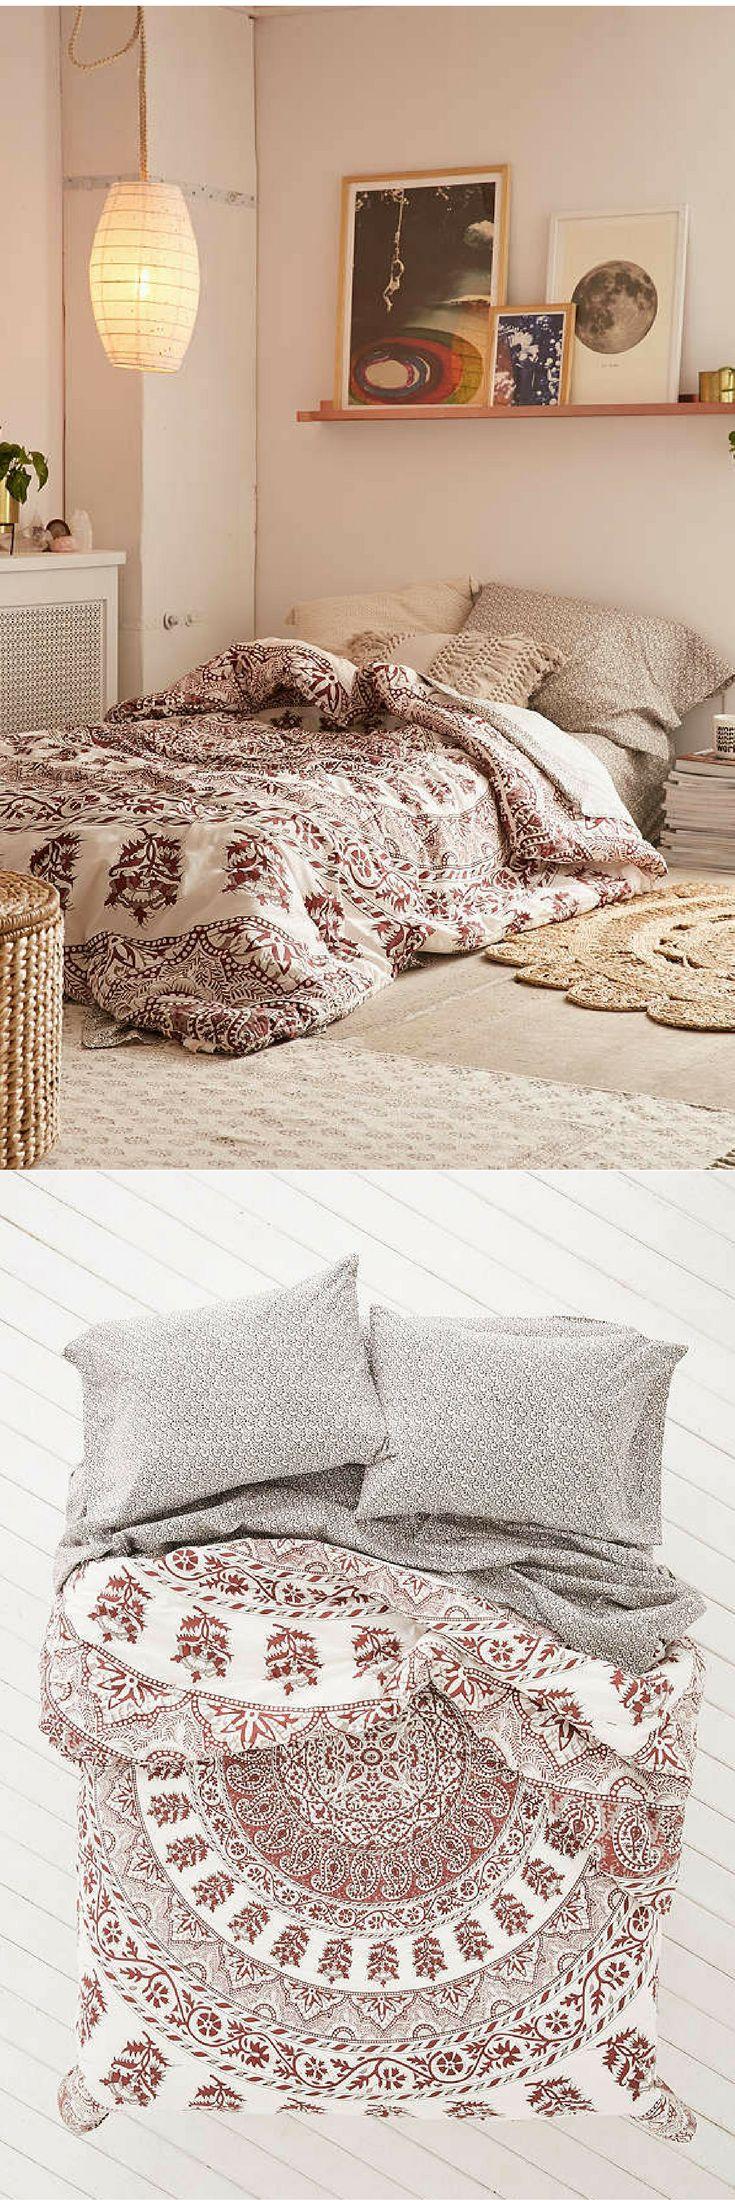 Best 25+ Romantic bedroom decor ideas on Pinterest | Romantic ...